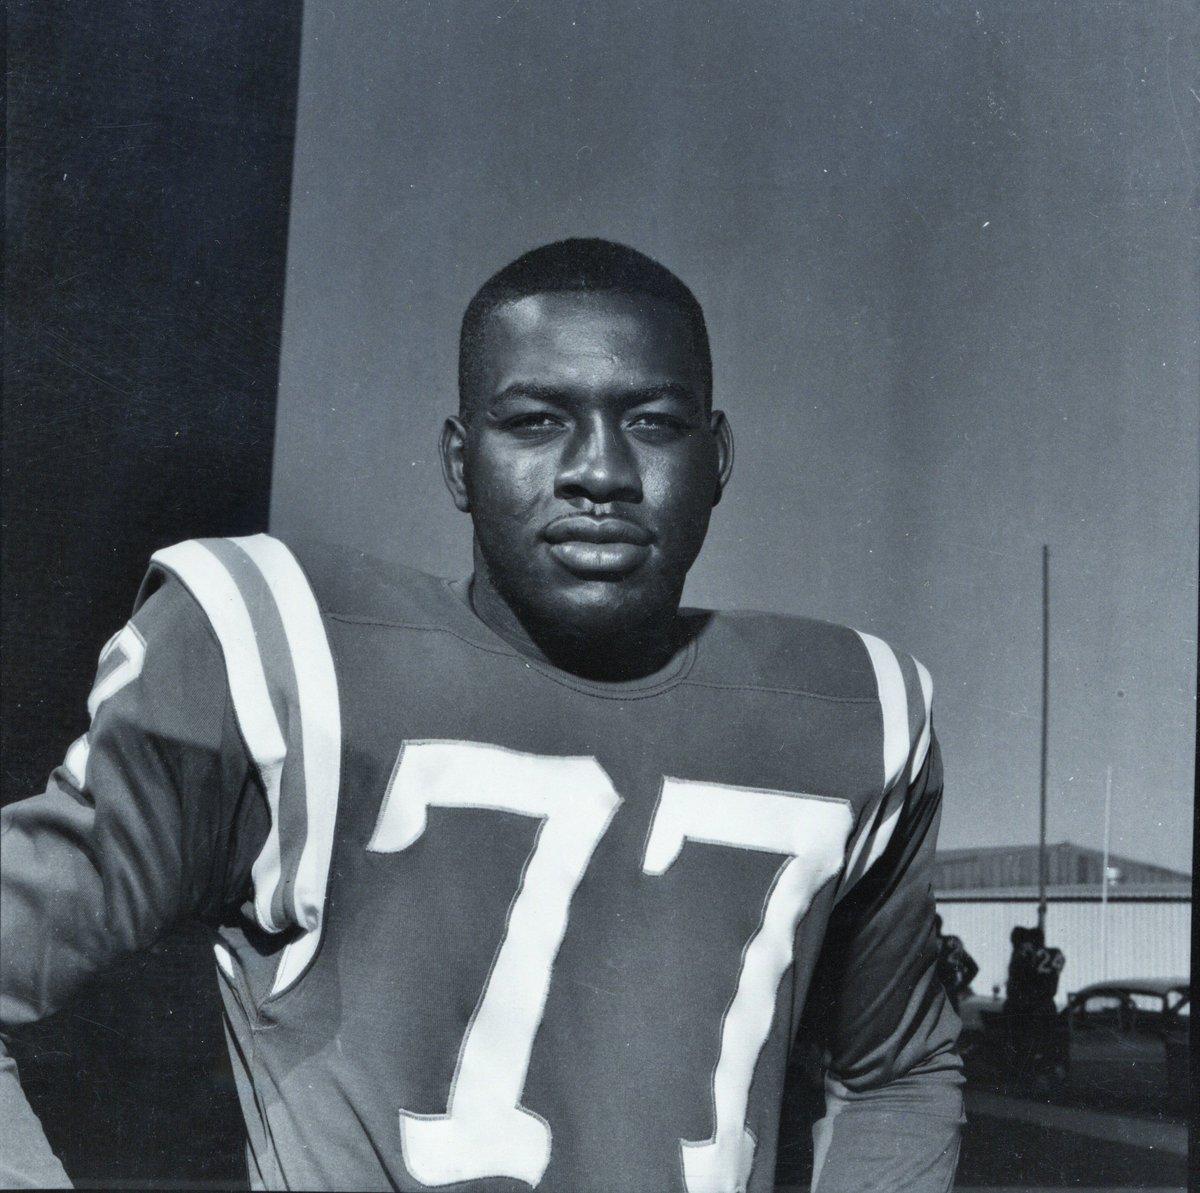 Ernie Pitts